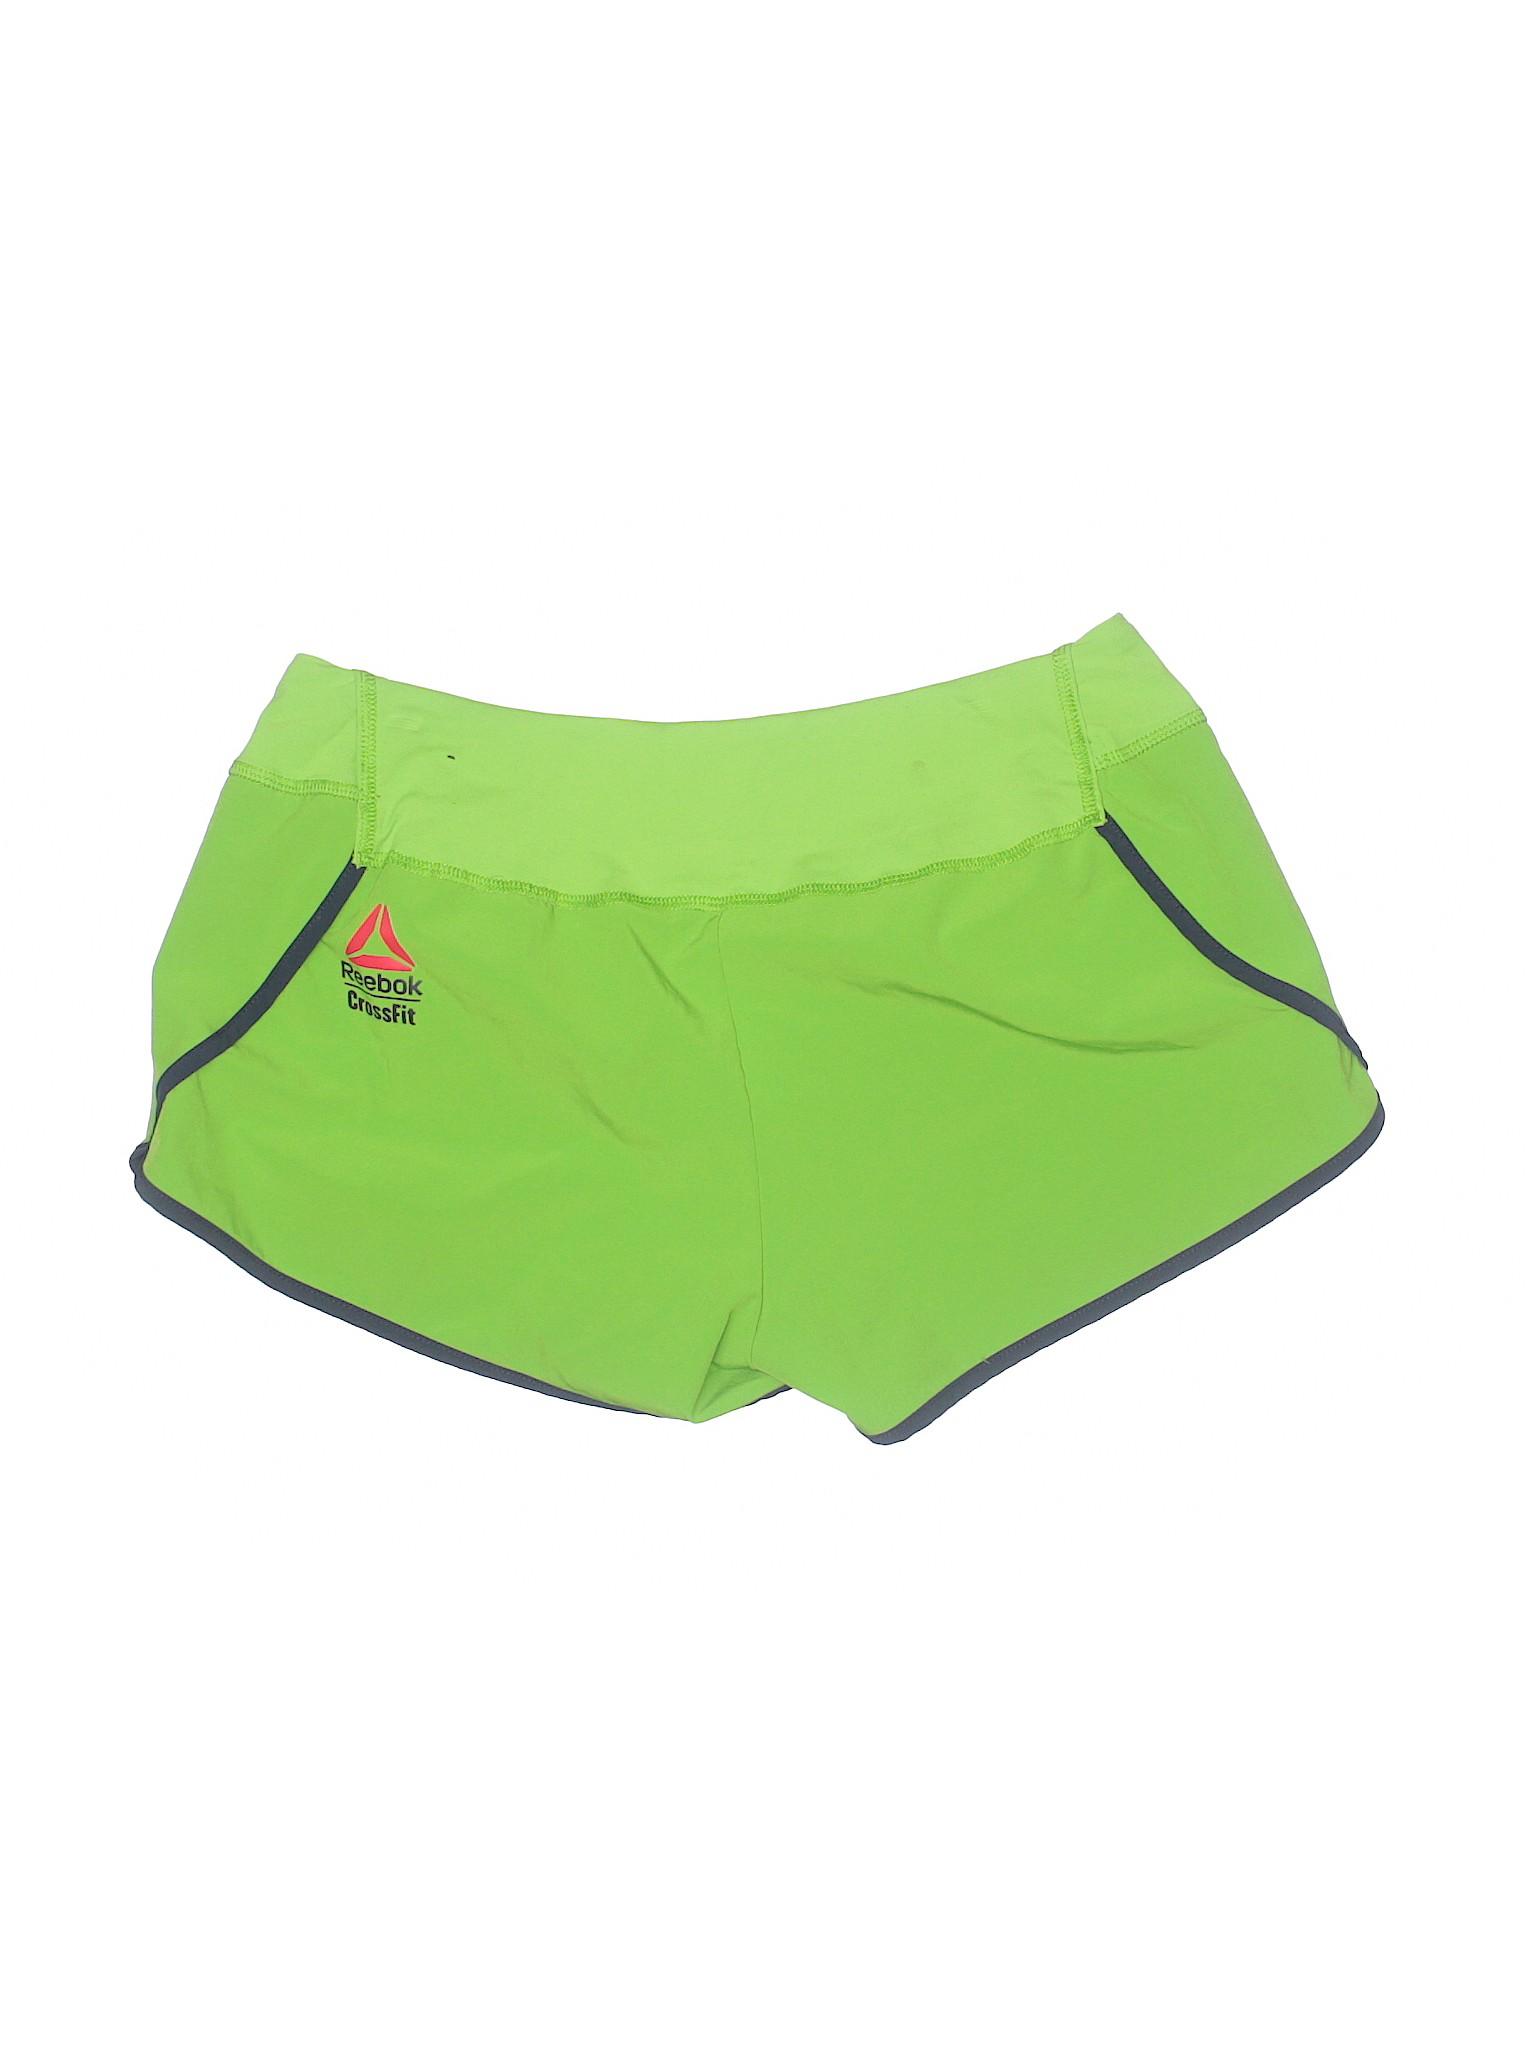 Athletic Boutique Reebok Shorts Boutique Athletic Reebok Shorts qrxrPwWRn6